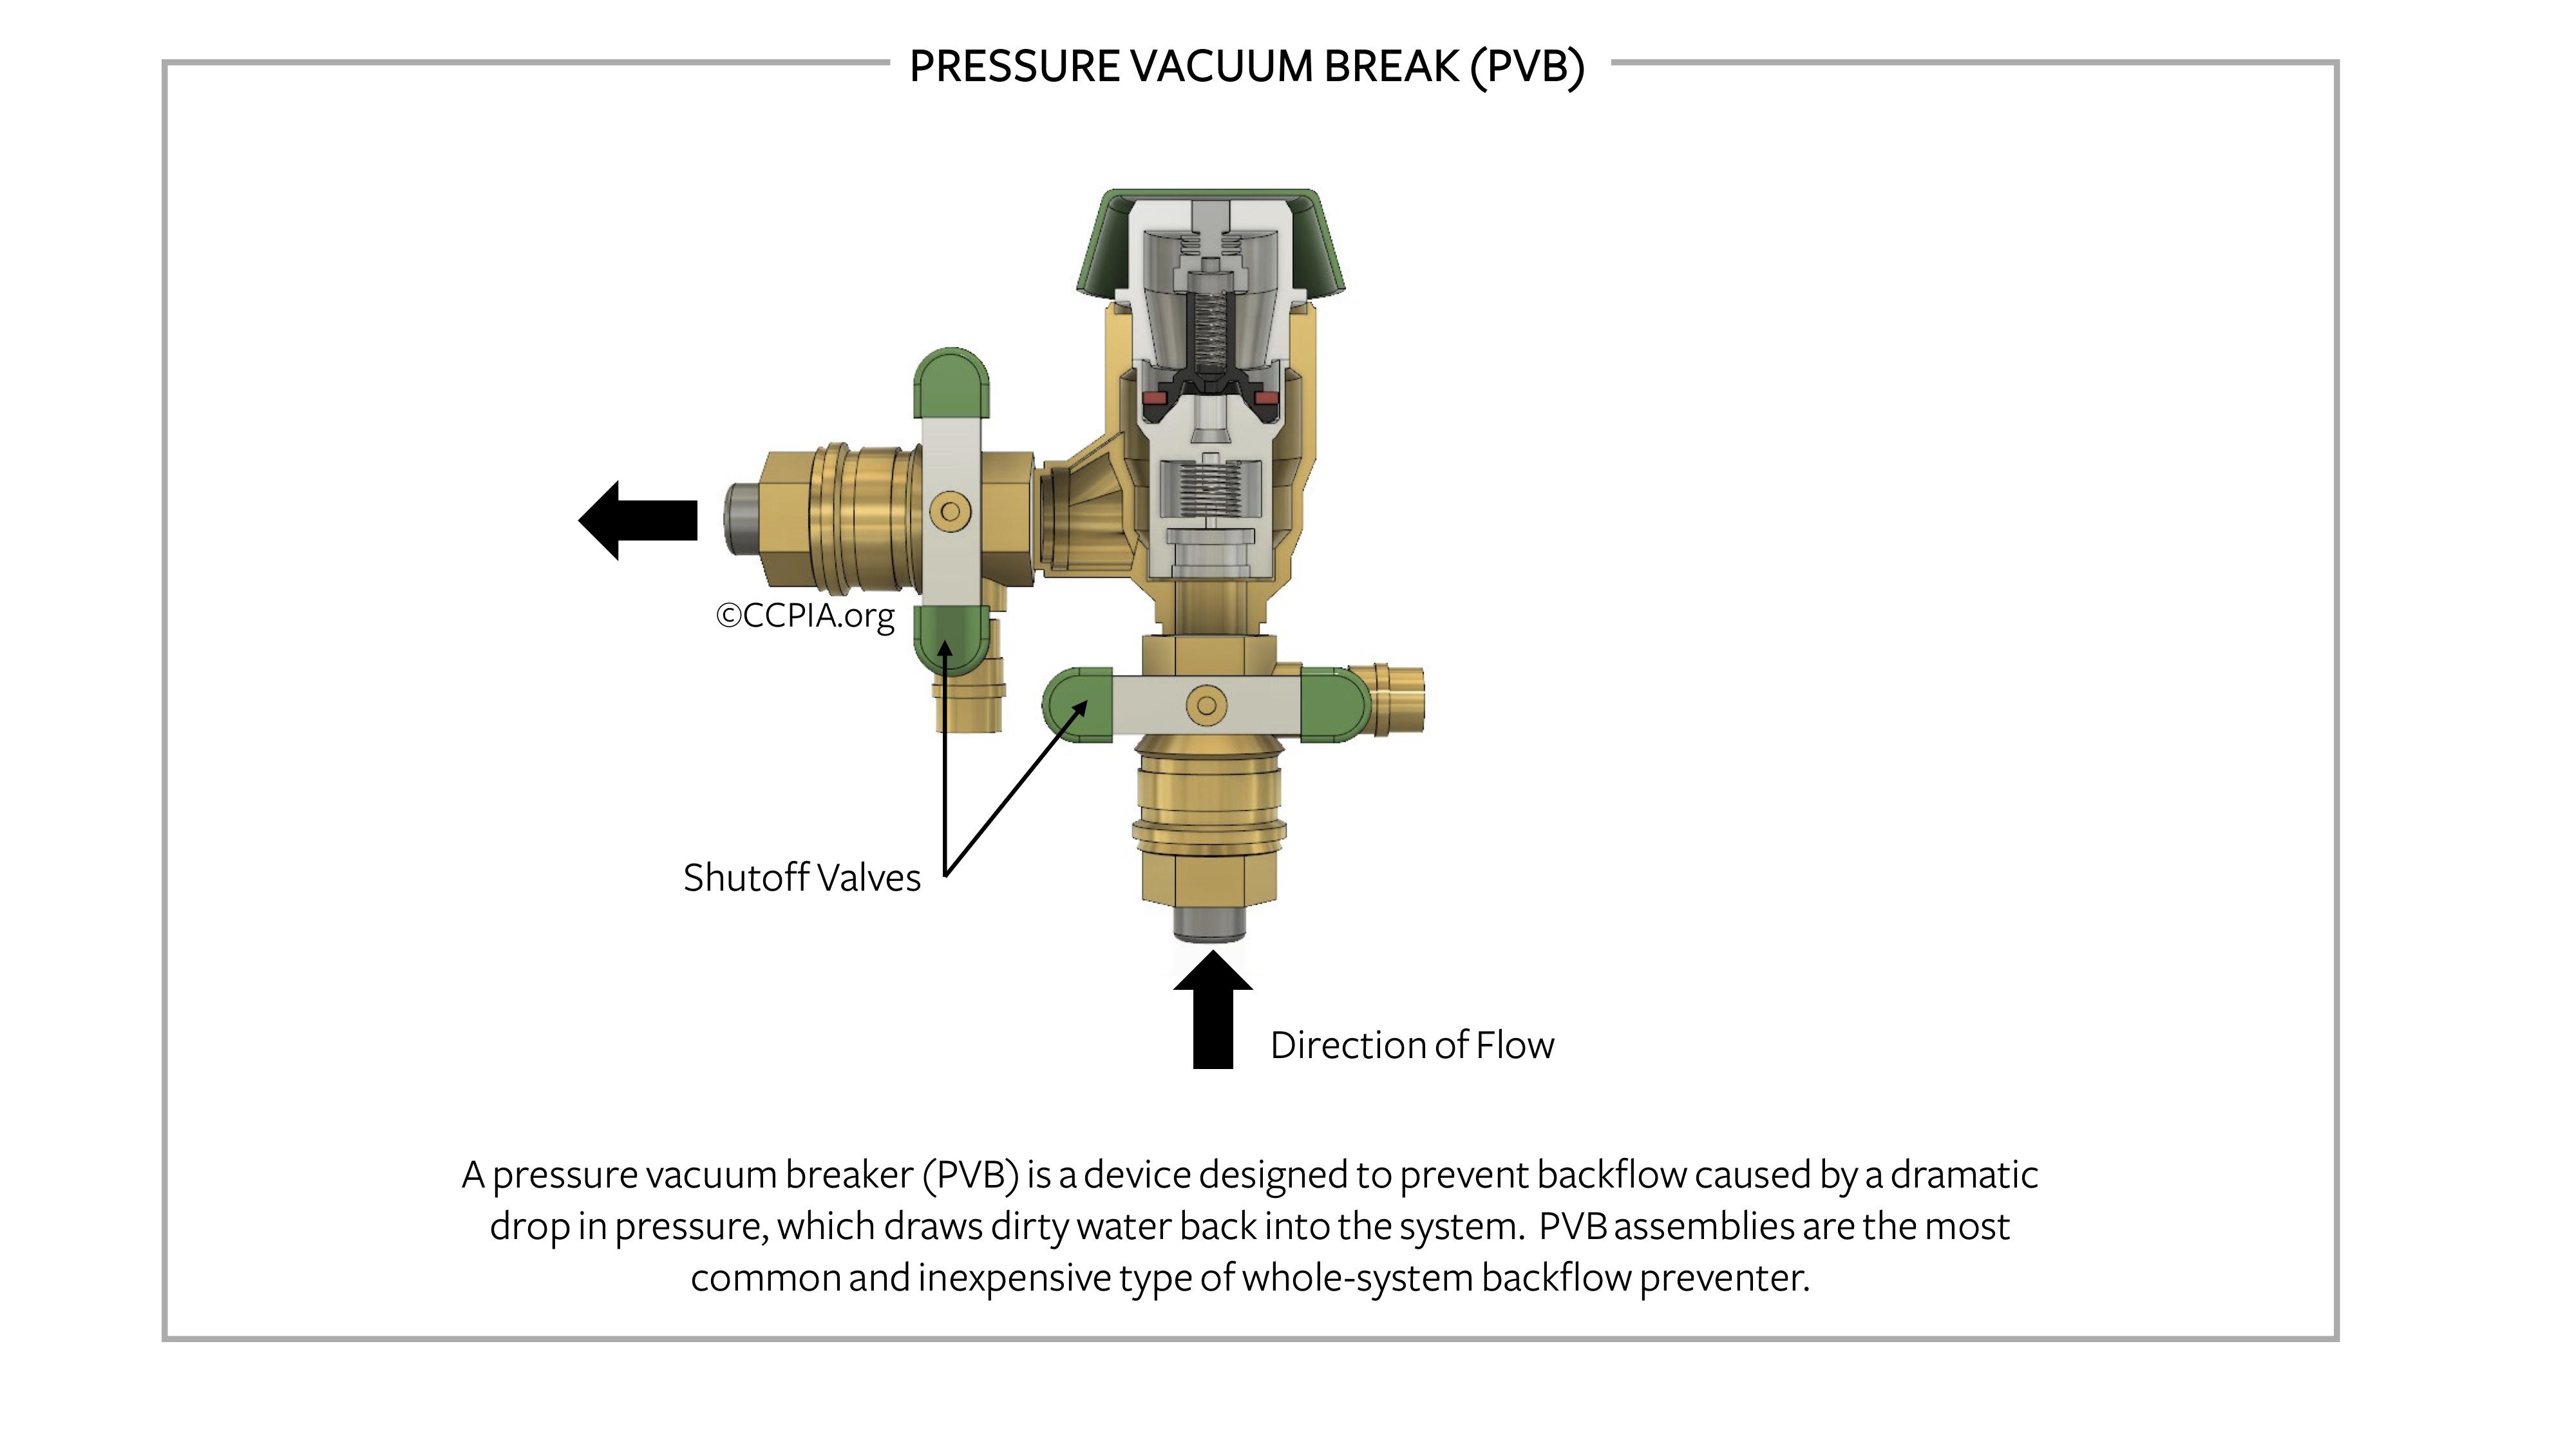 Pressure vacuum breaker backflow preventer.